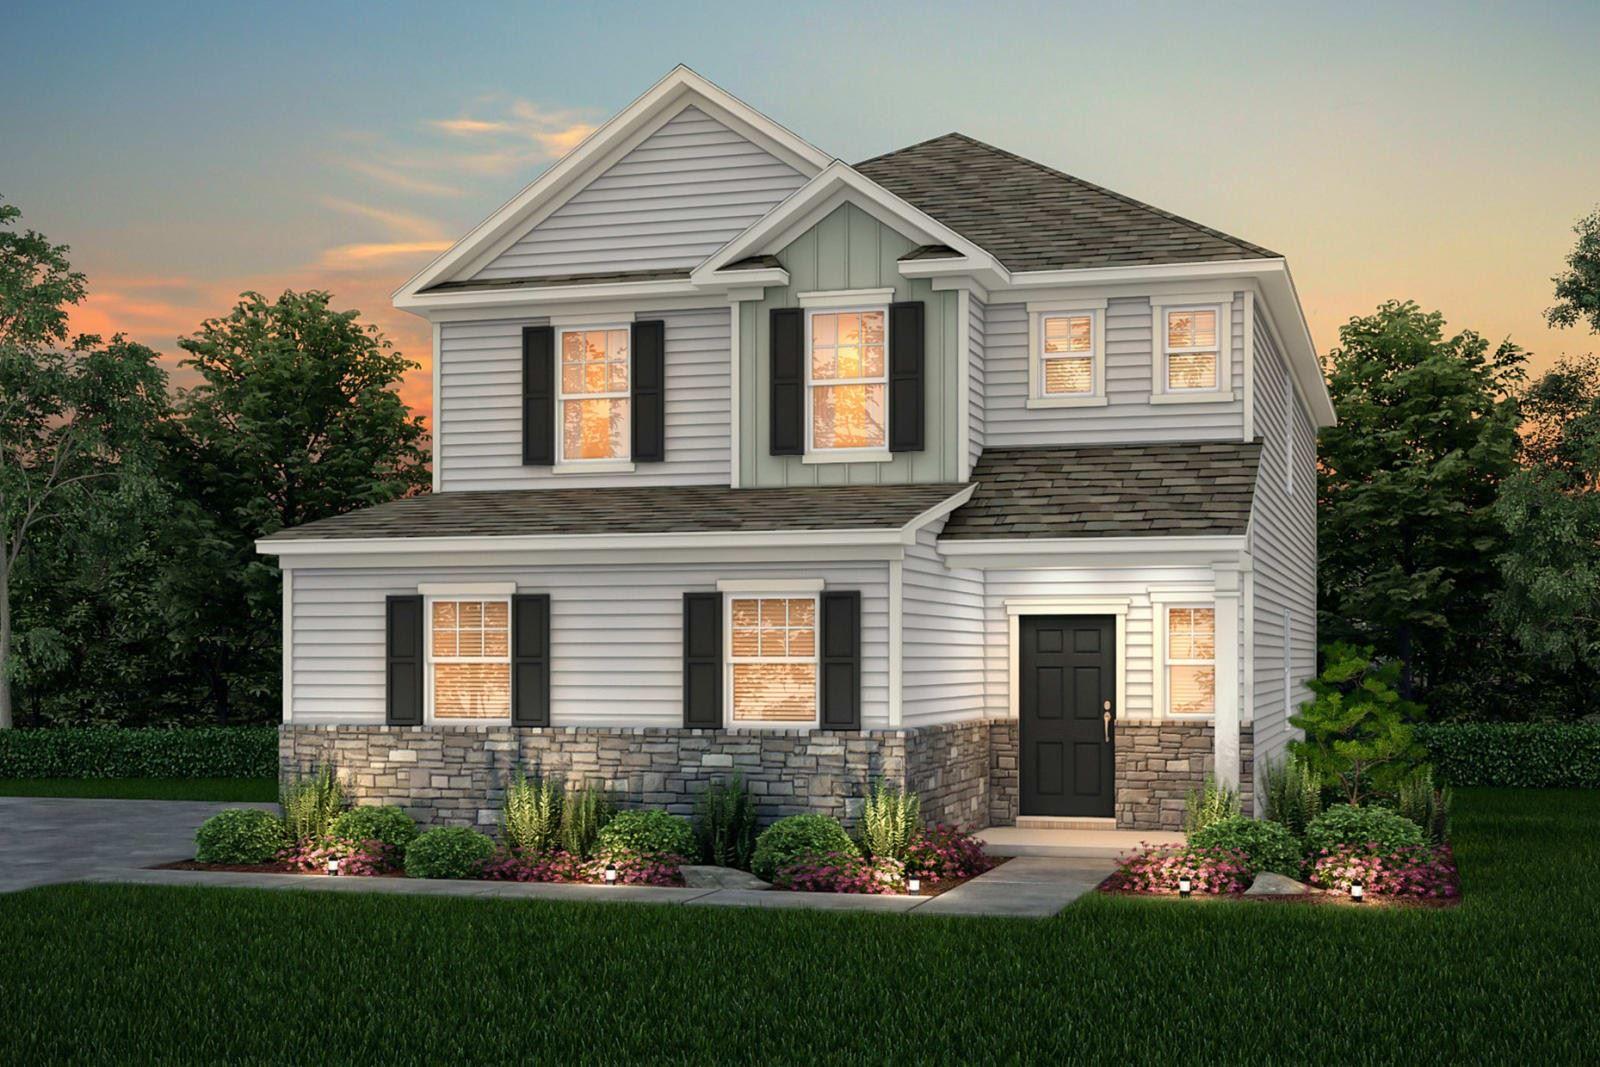 3011 Posada Court E, Spring Hill, TN 37174 - MLS#: 2283123